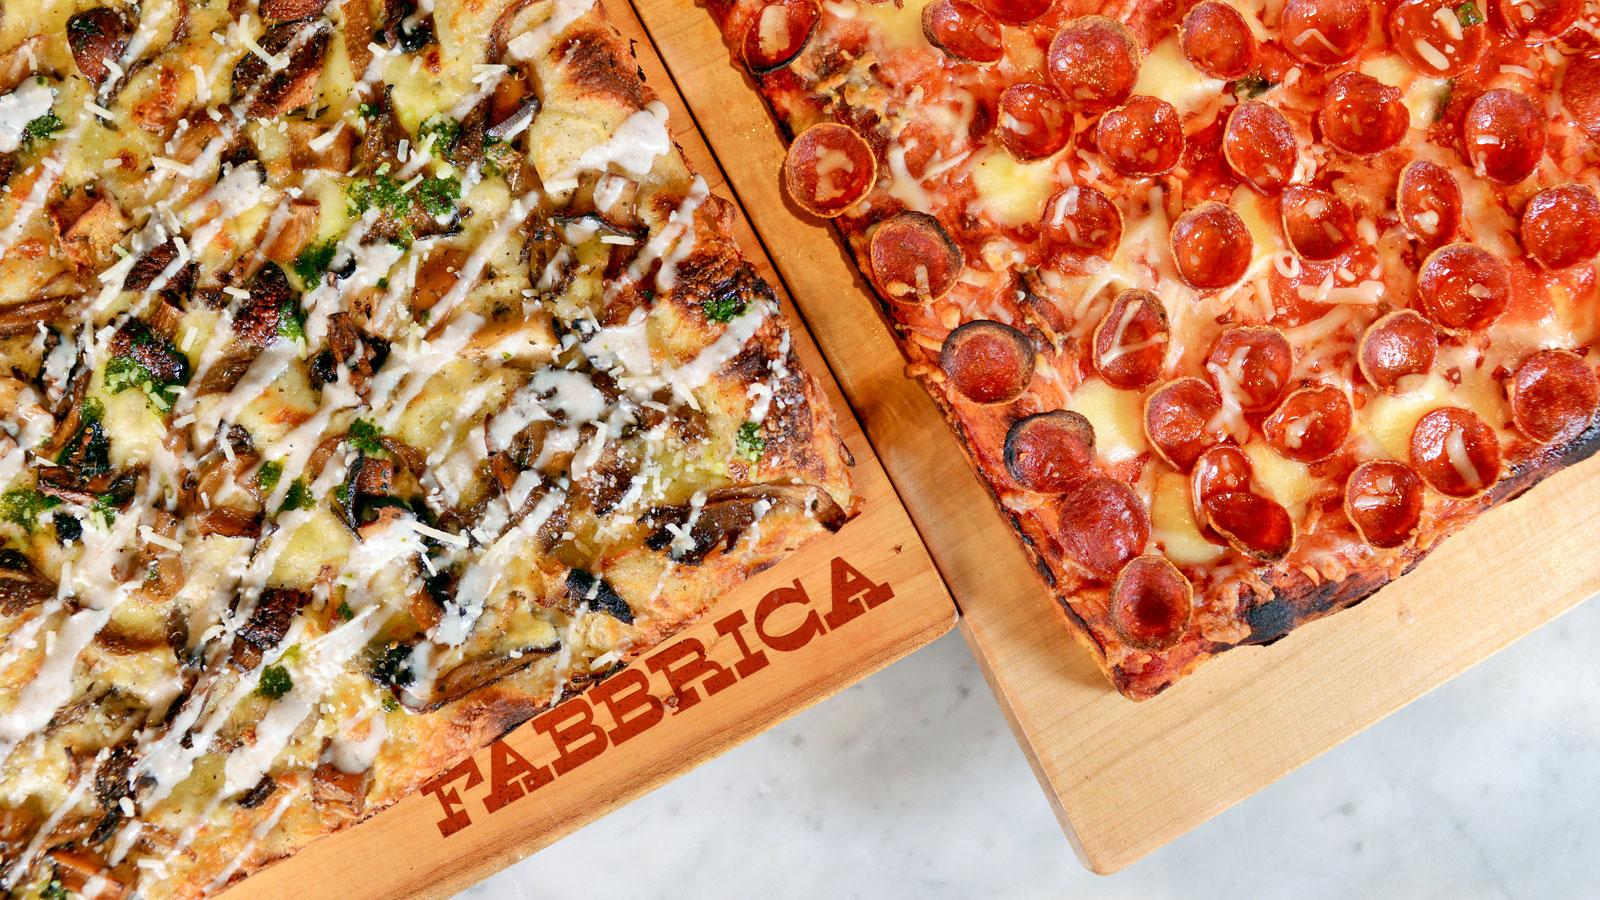 Fabbrica pizzas